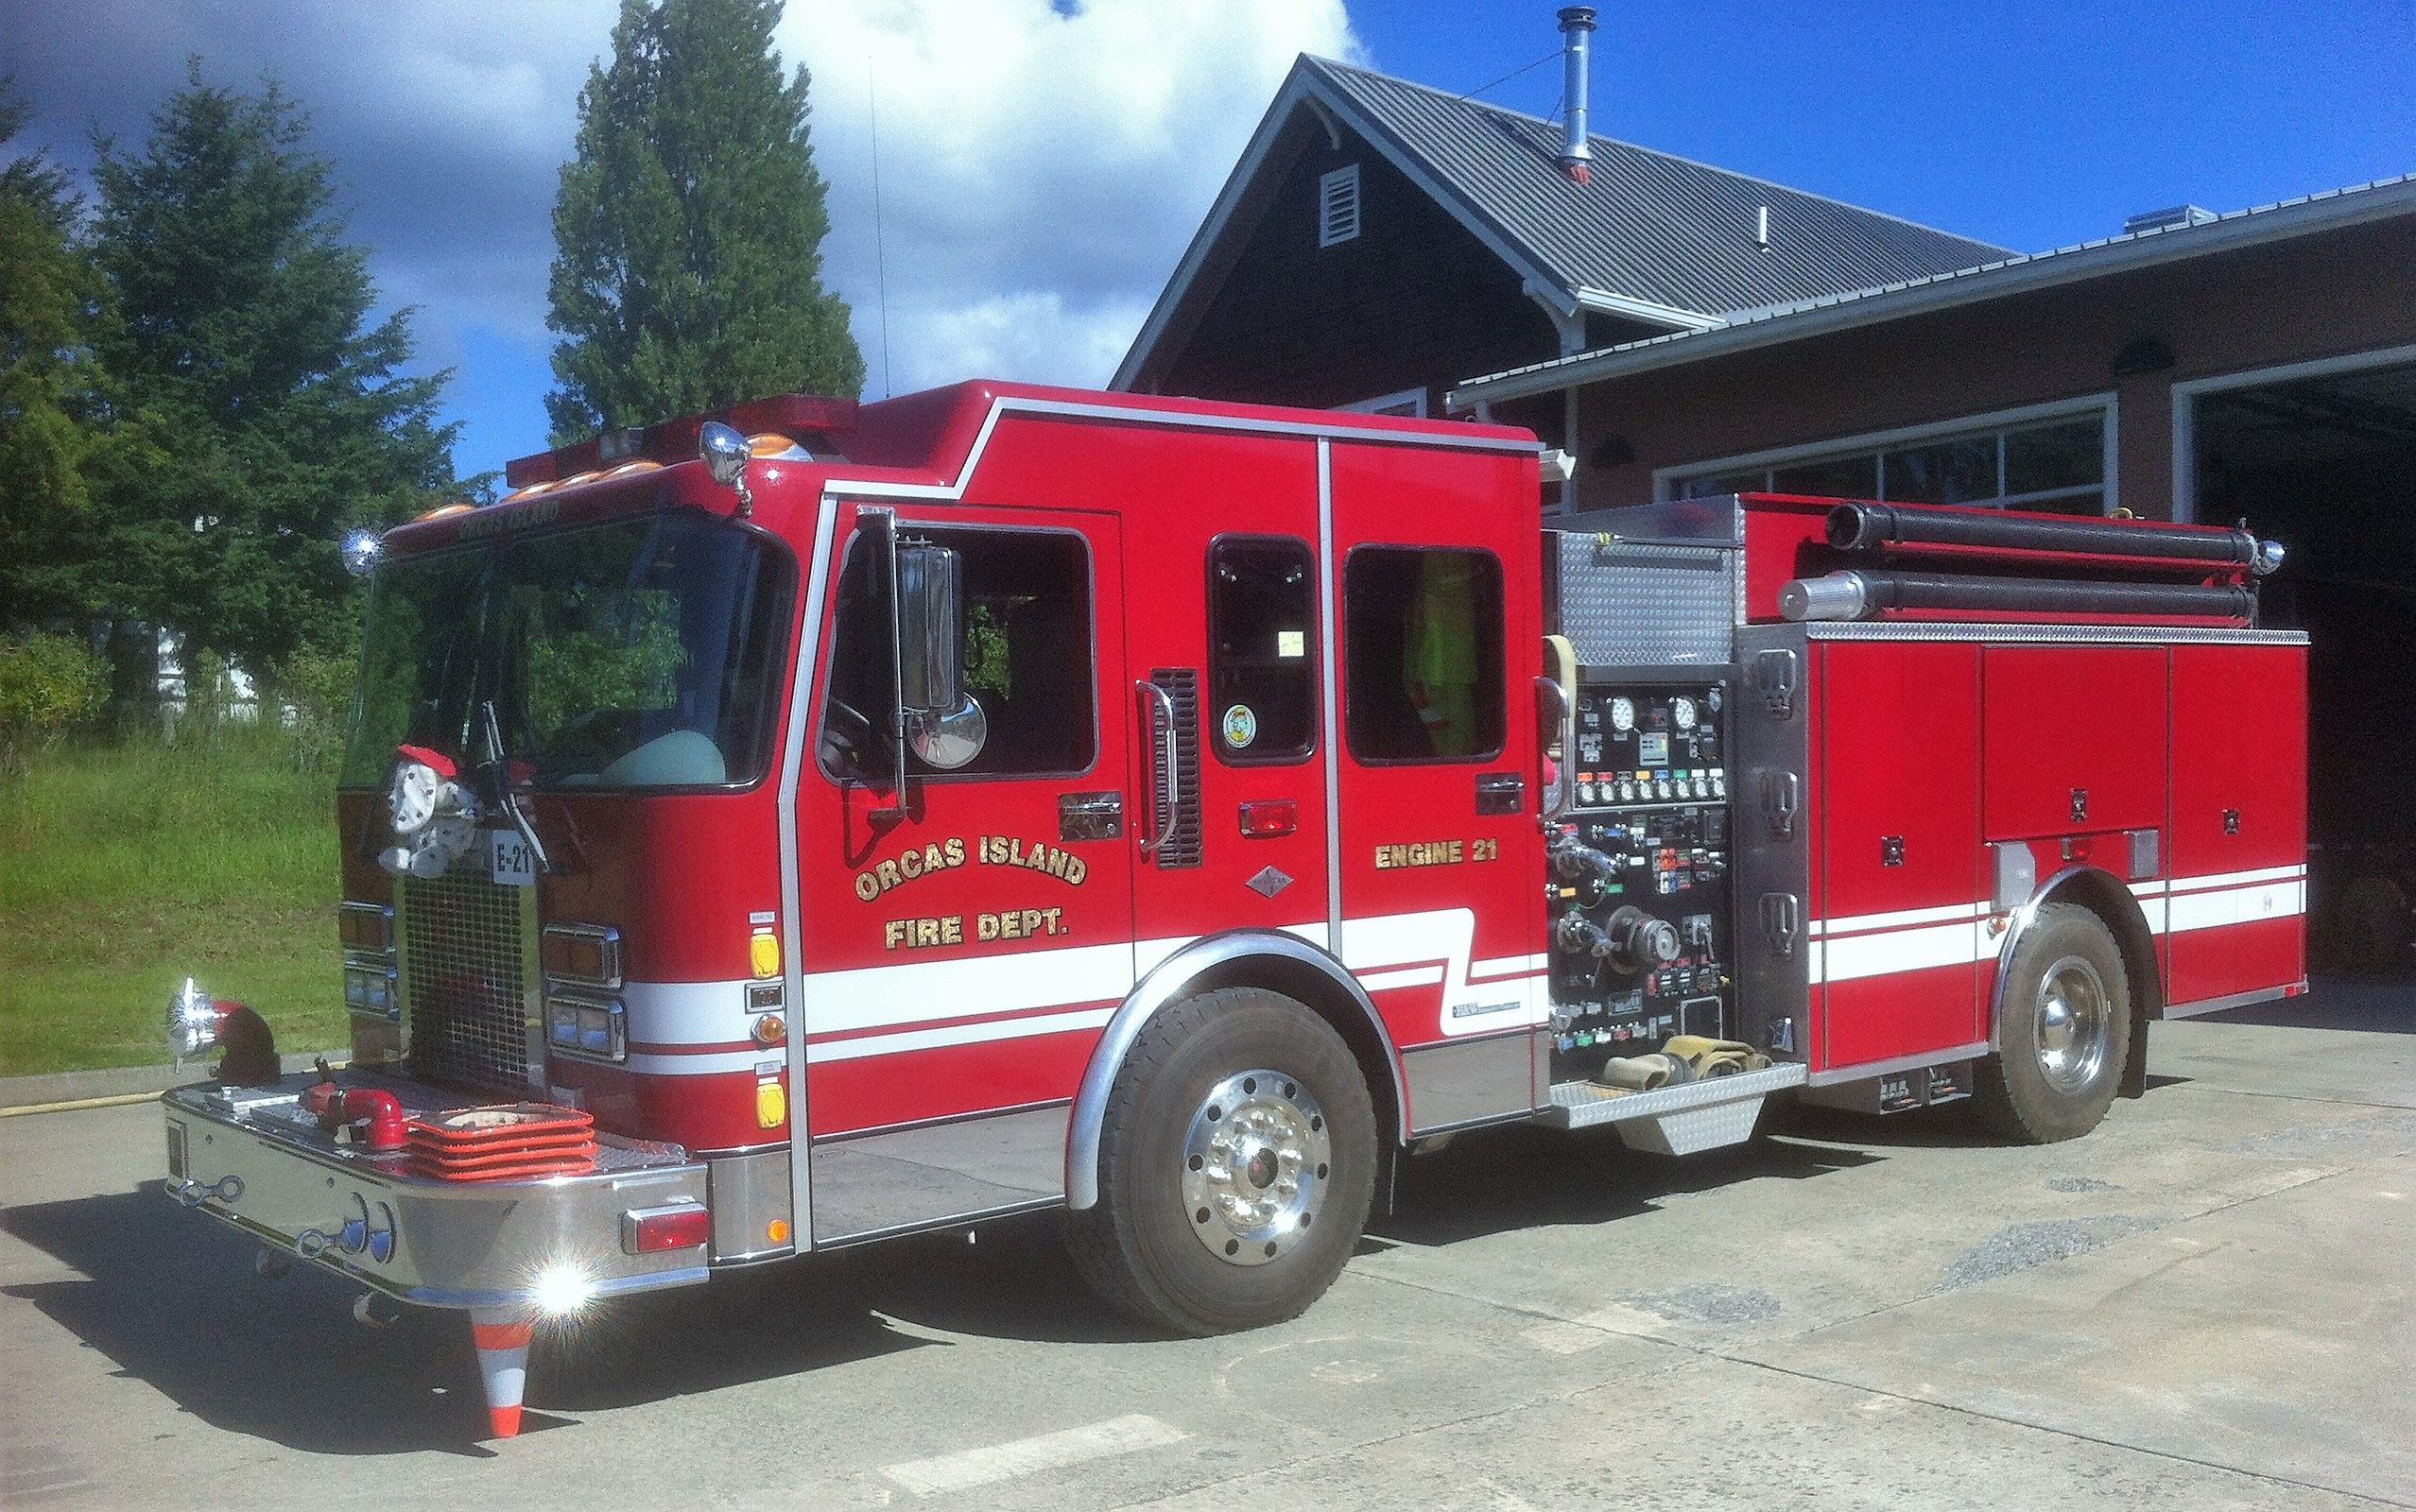 medium resolution of orcas island fire rescue engine 21 1999 spartan h w 1250 1000 cafs engine